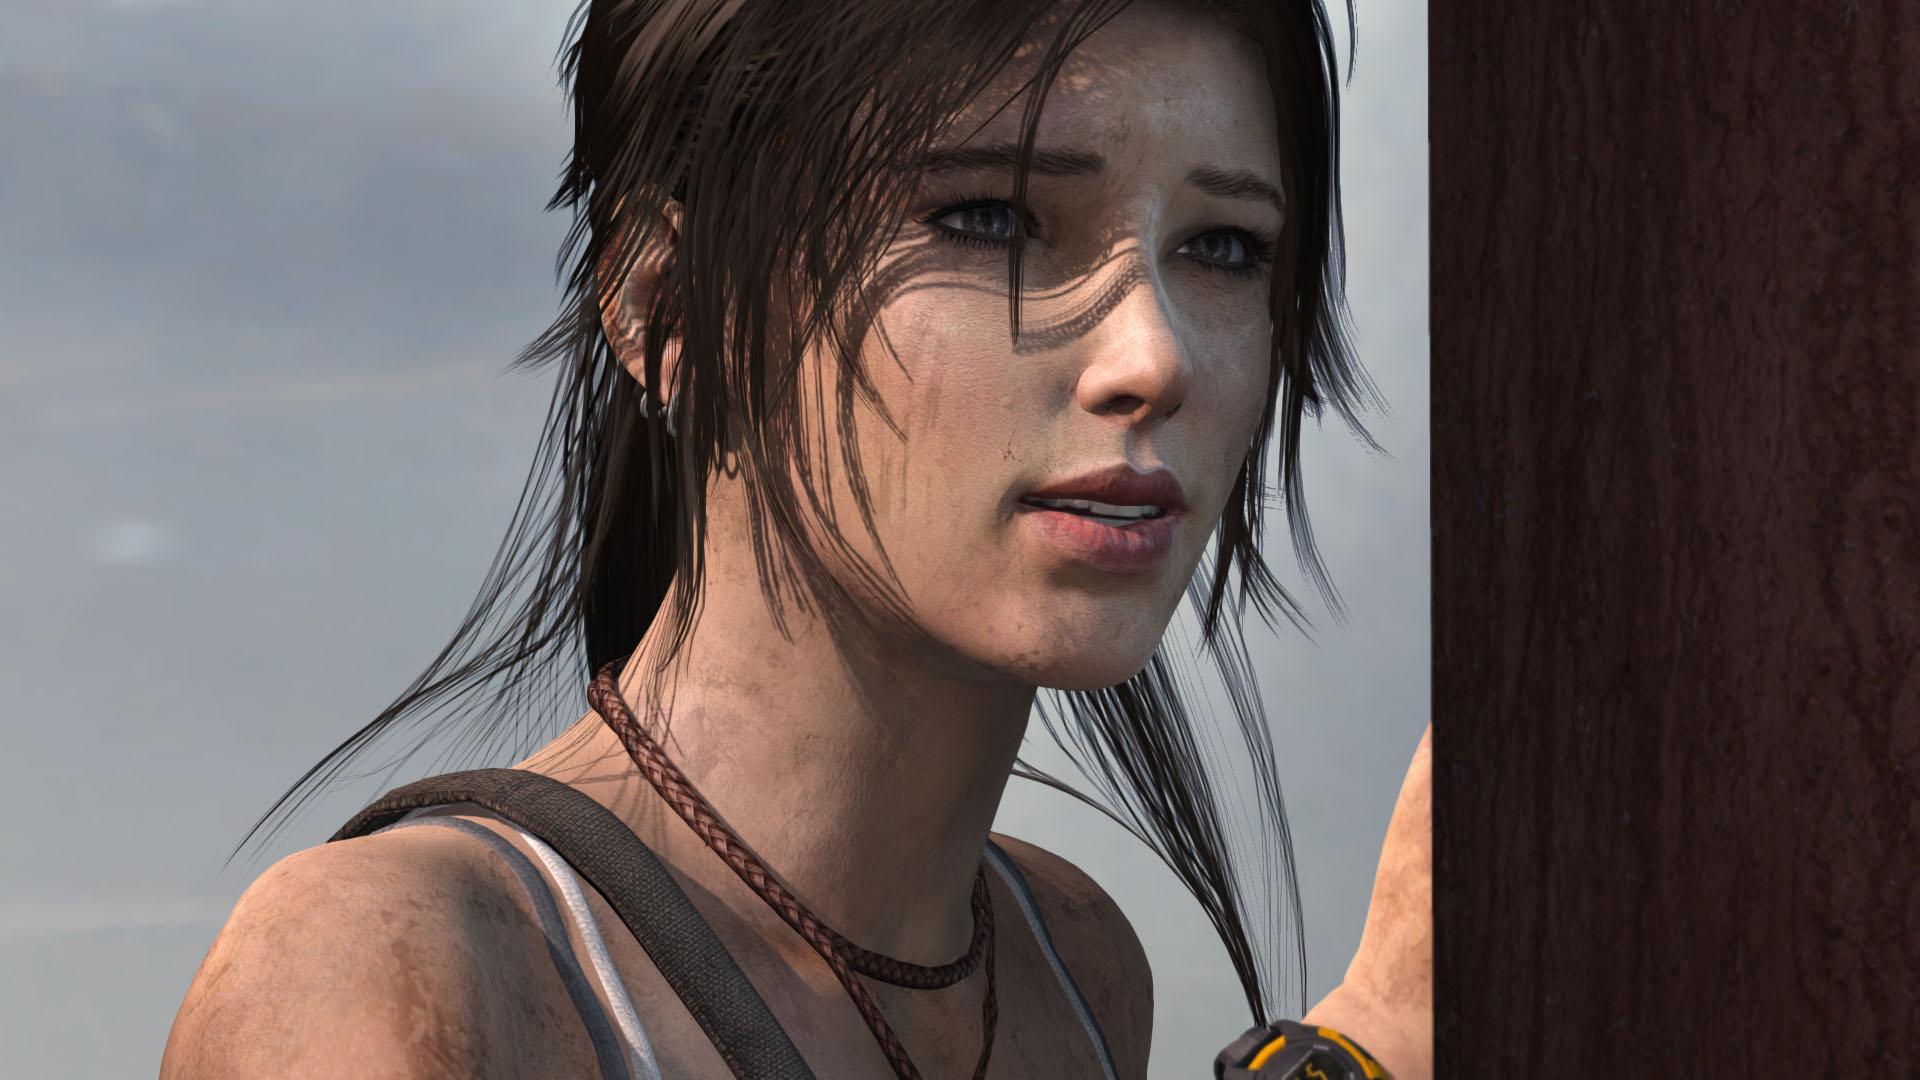 Lara croft hair nude films